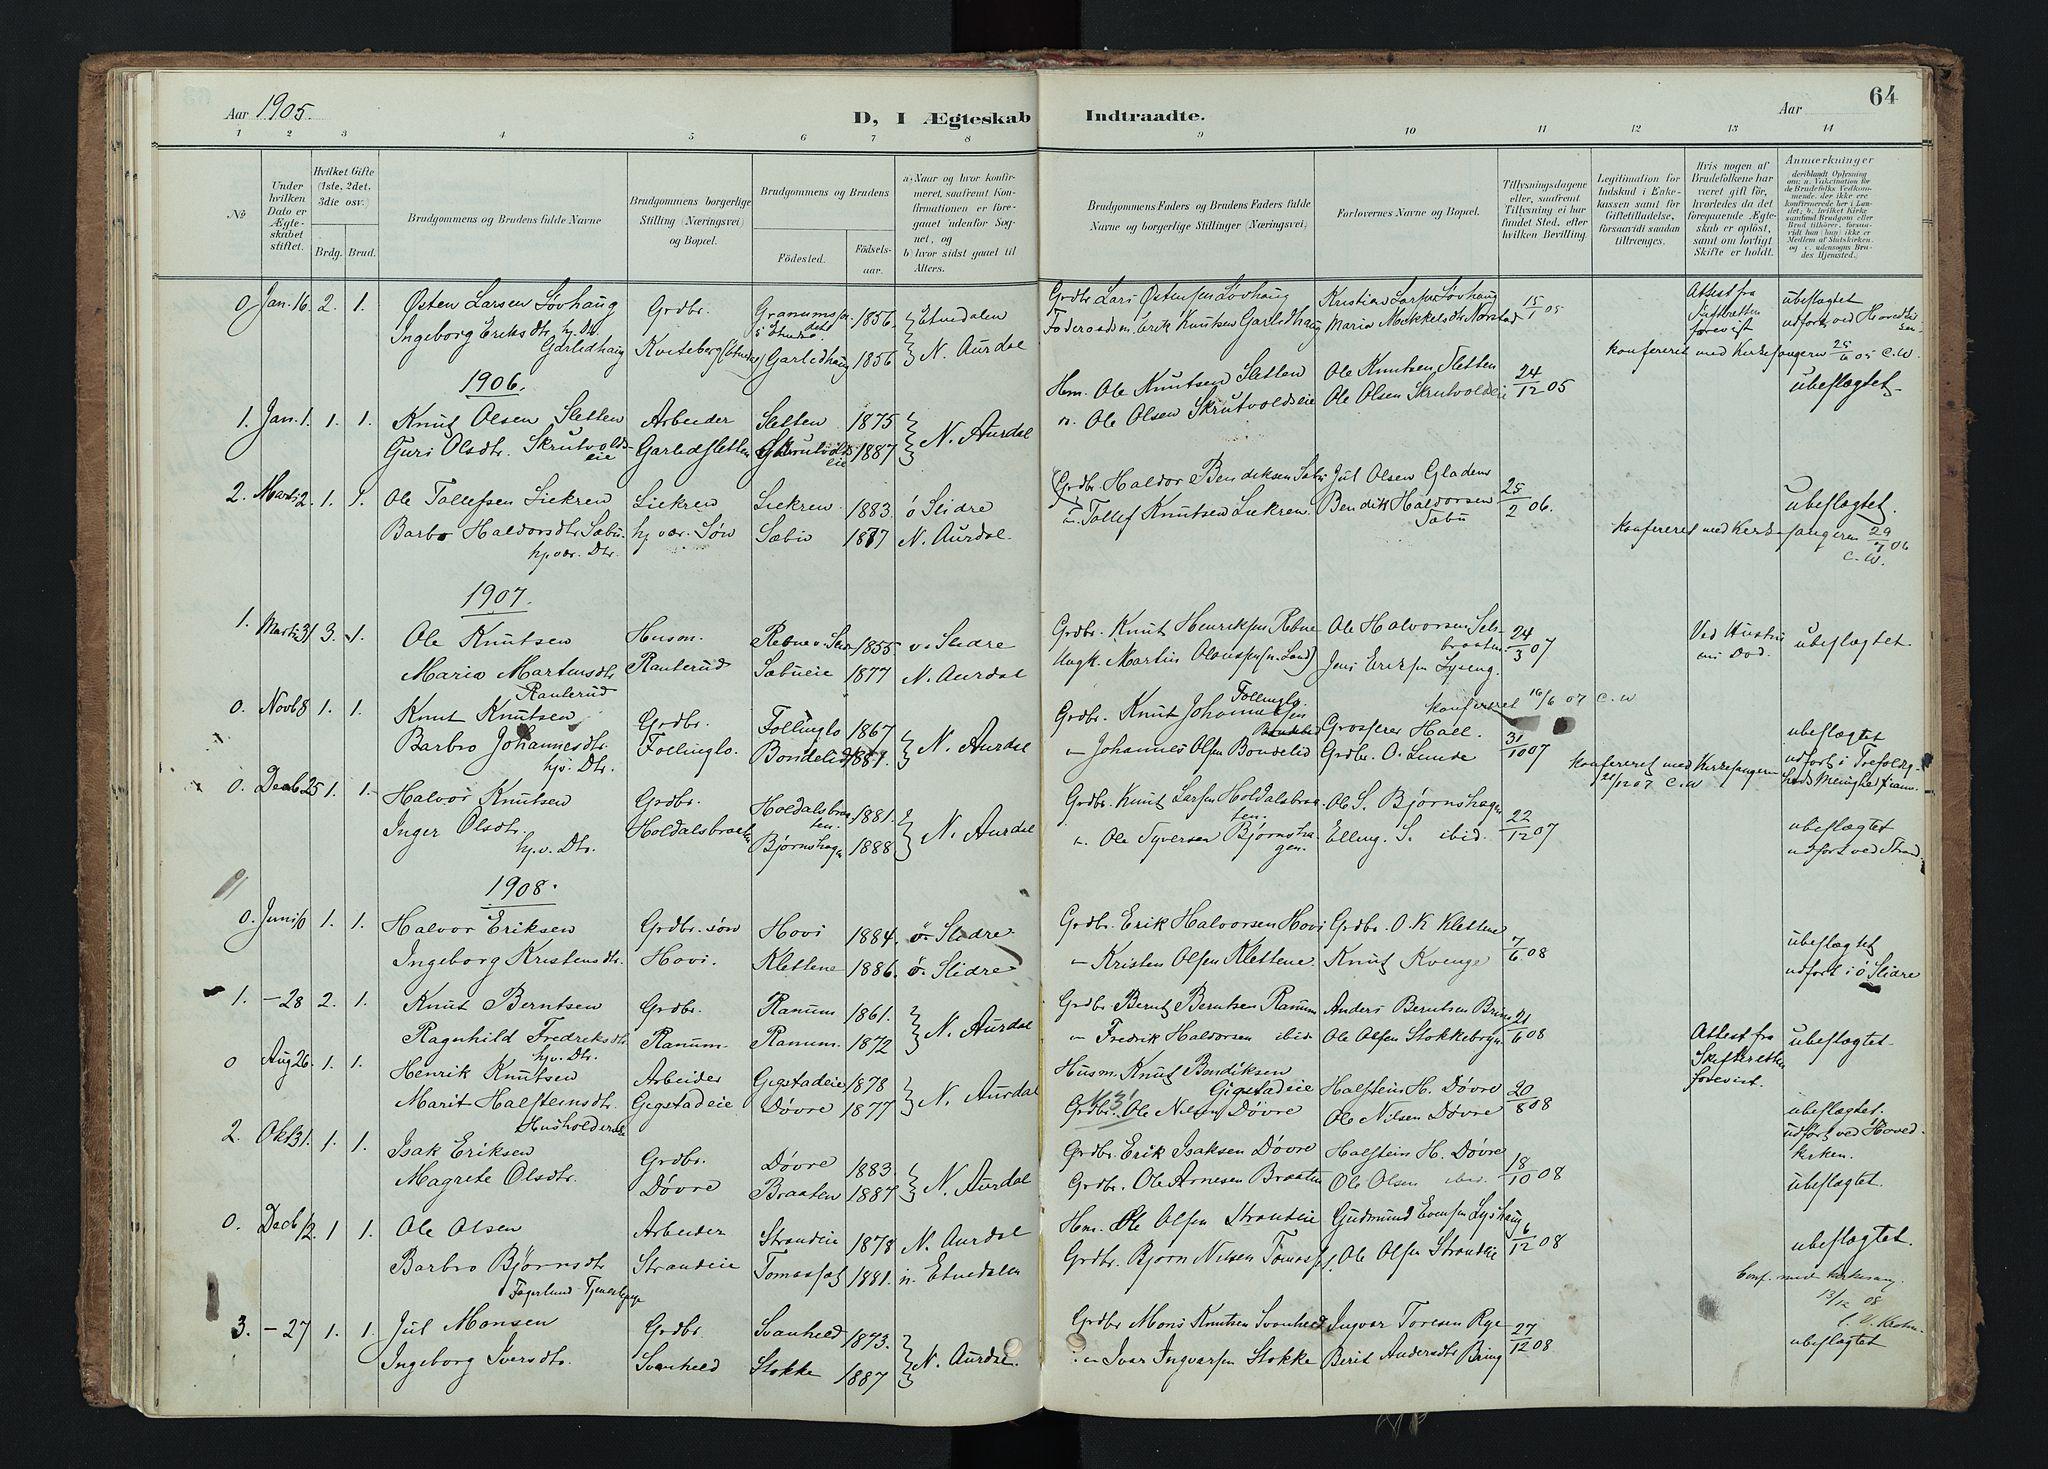 SAH, Nord-Aurdal prestekontor, Ministerialbok nr. 15, 1896-1914, s. 64